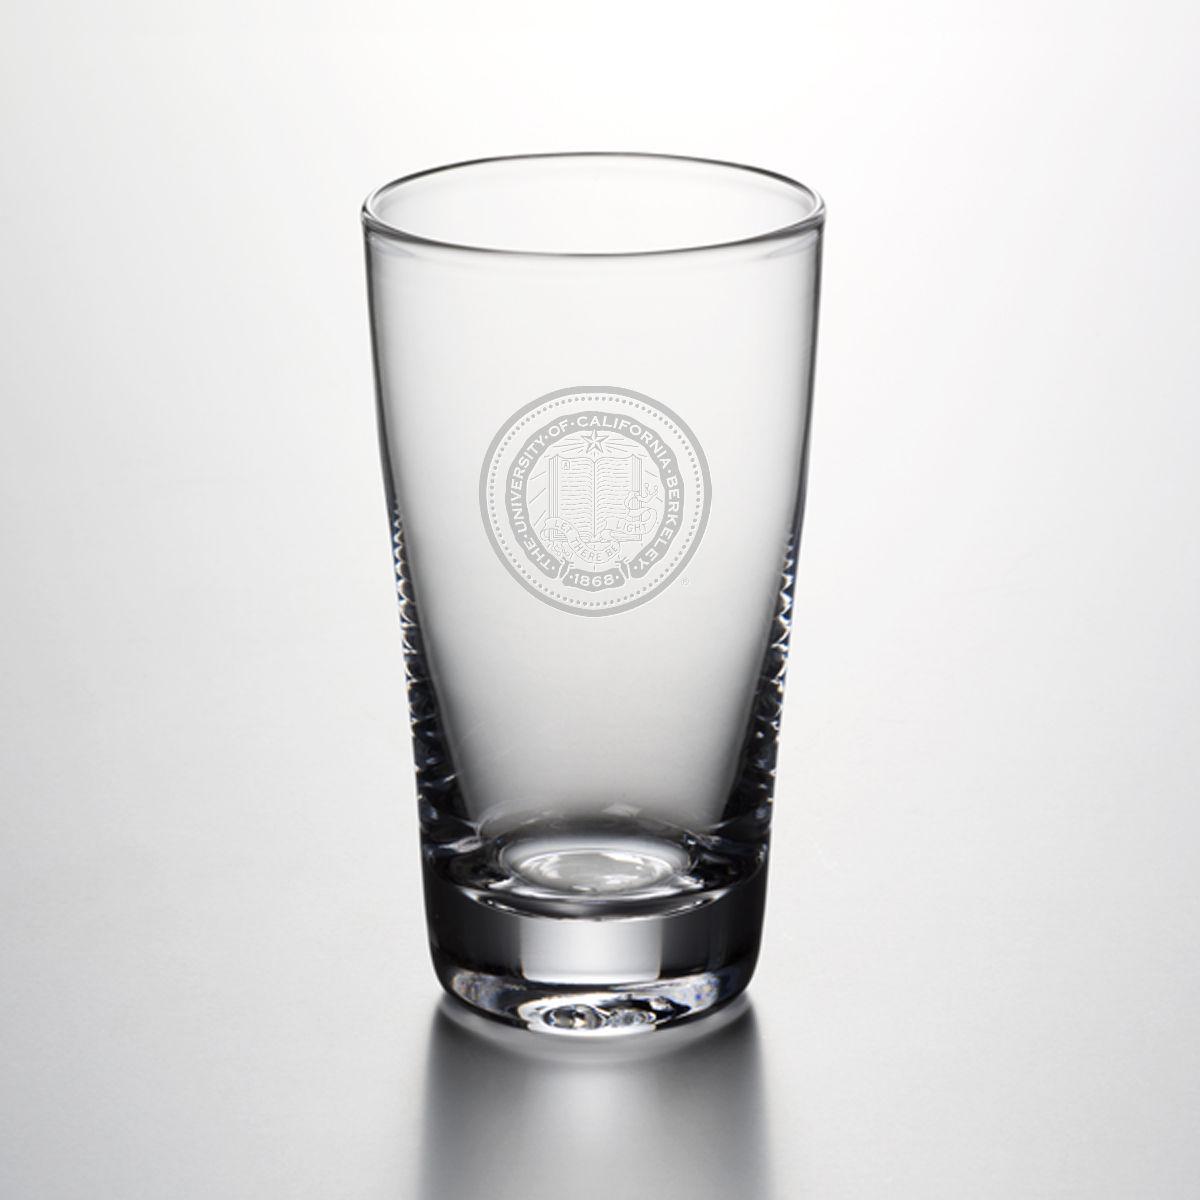 Berkeley Ascutney Pint Glass by Simon Pearce